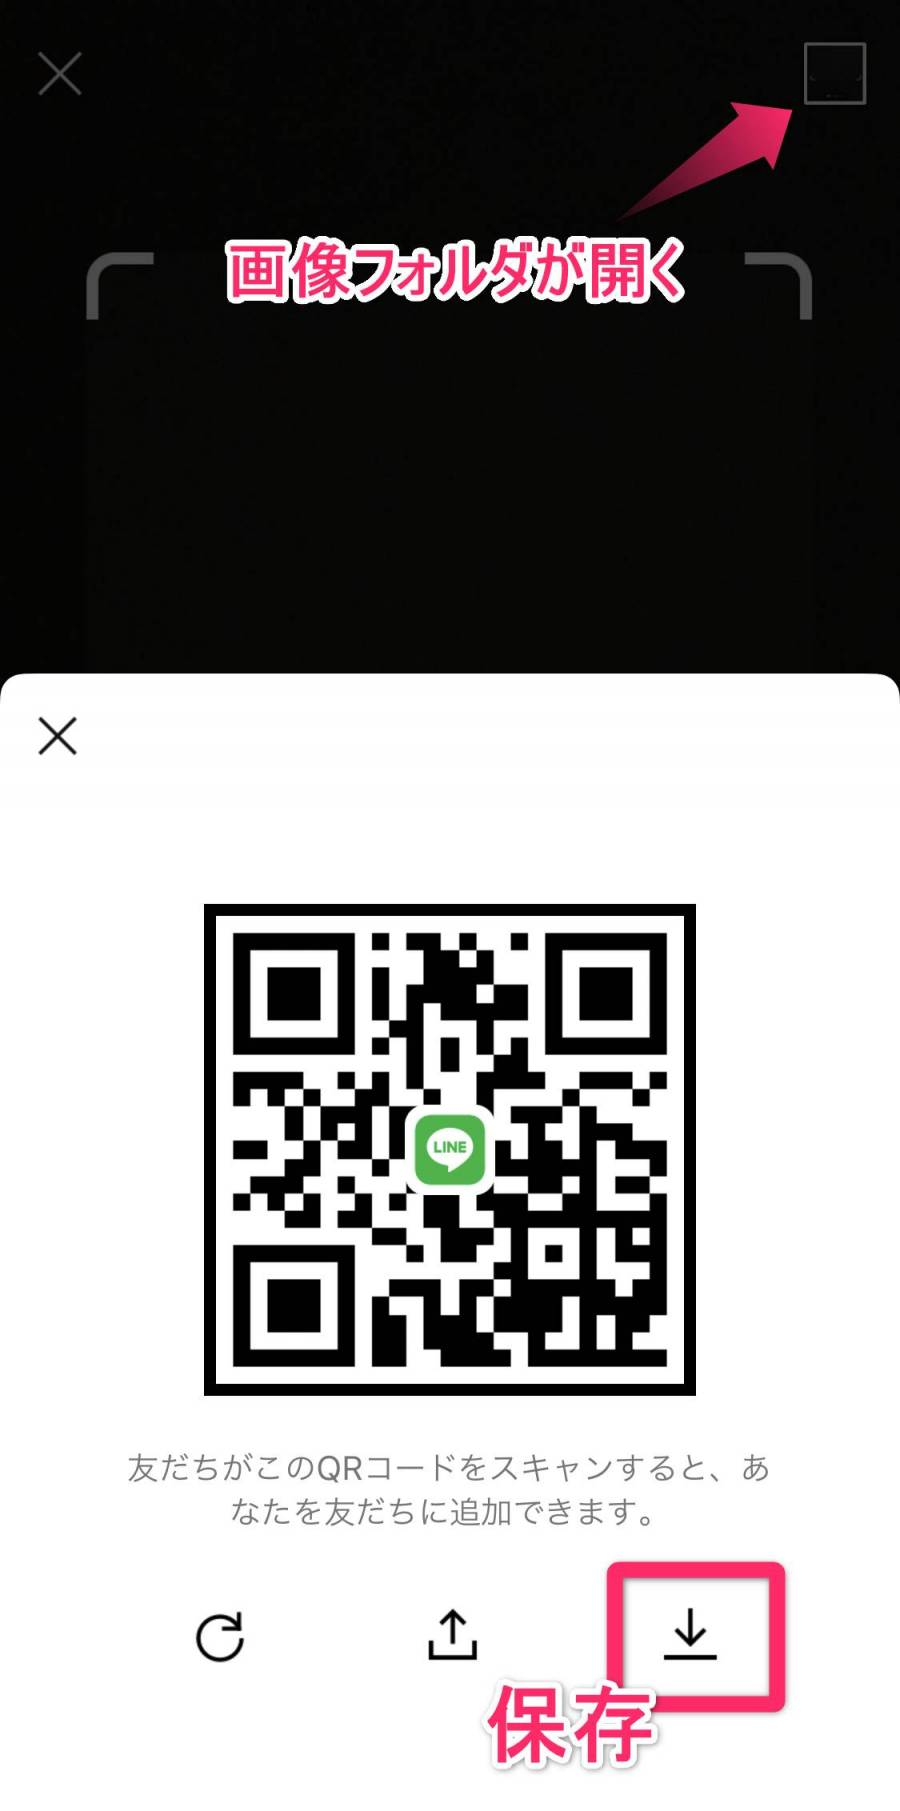 LINE QRコード保存